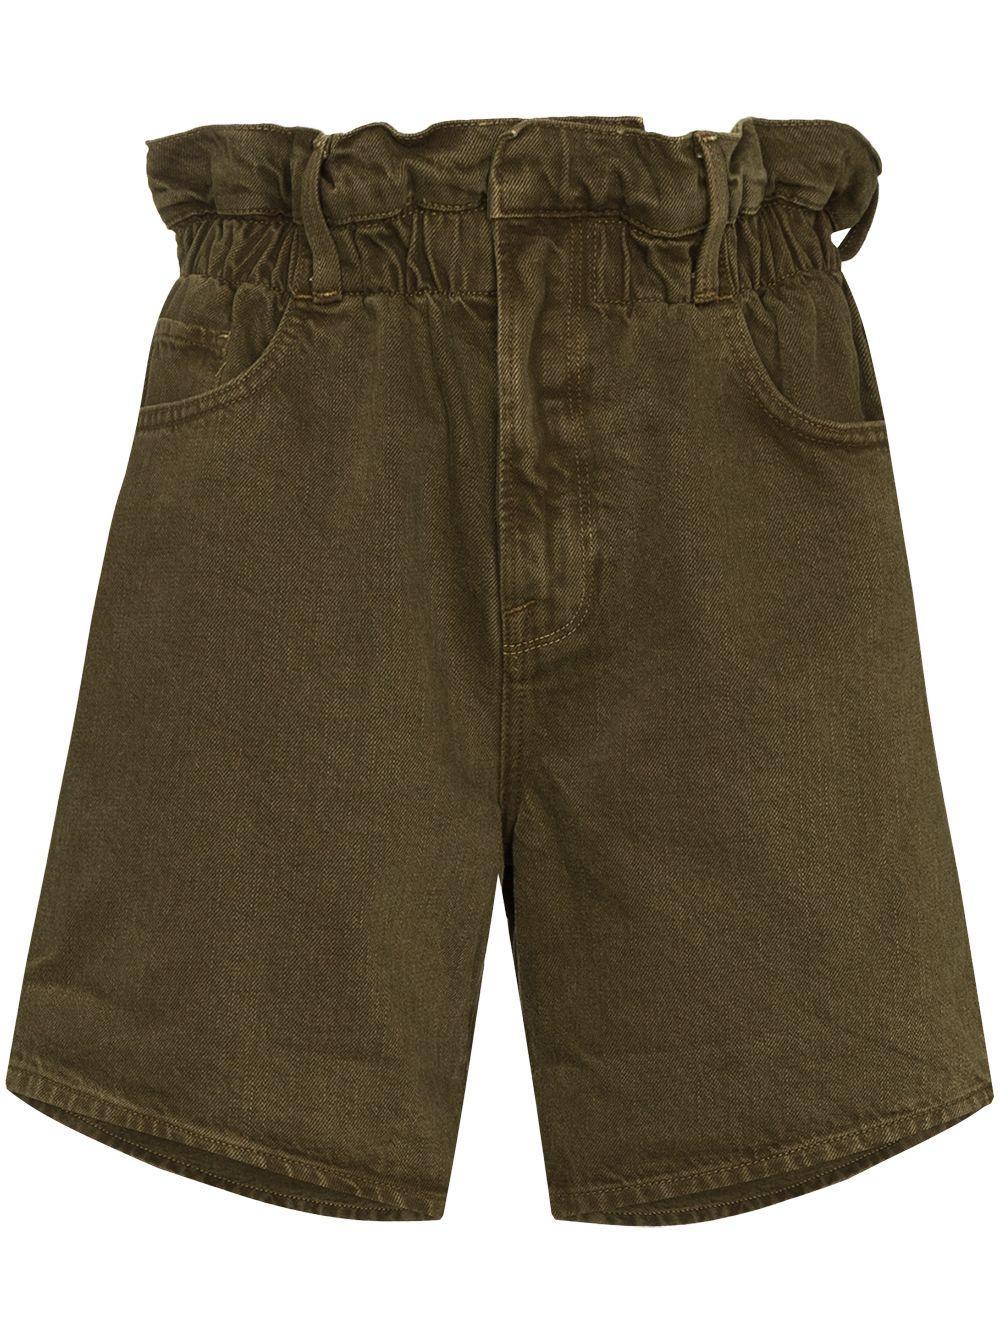 Elastic Waist Jean Shorts